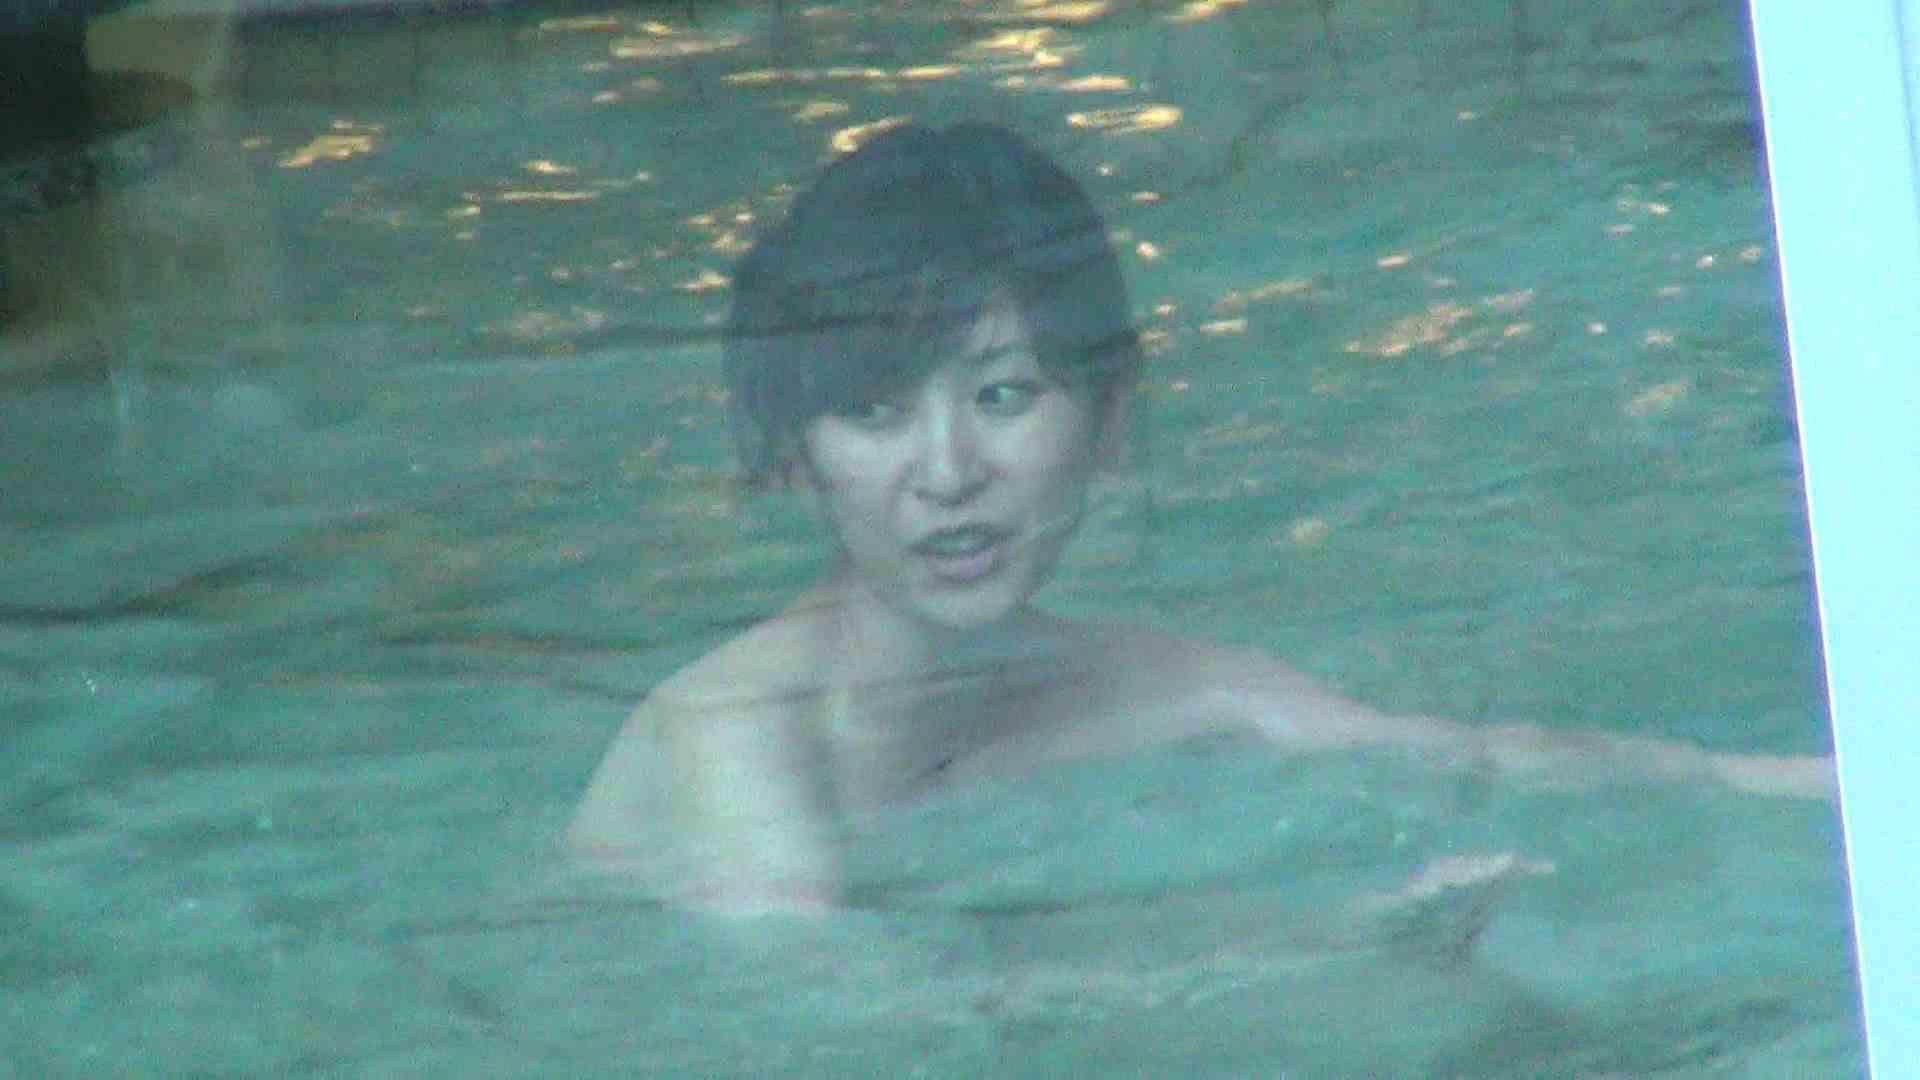 Aquaな露天風呂Vol.294 綺麗なOLたち  84枚 69